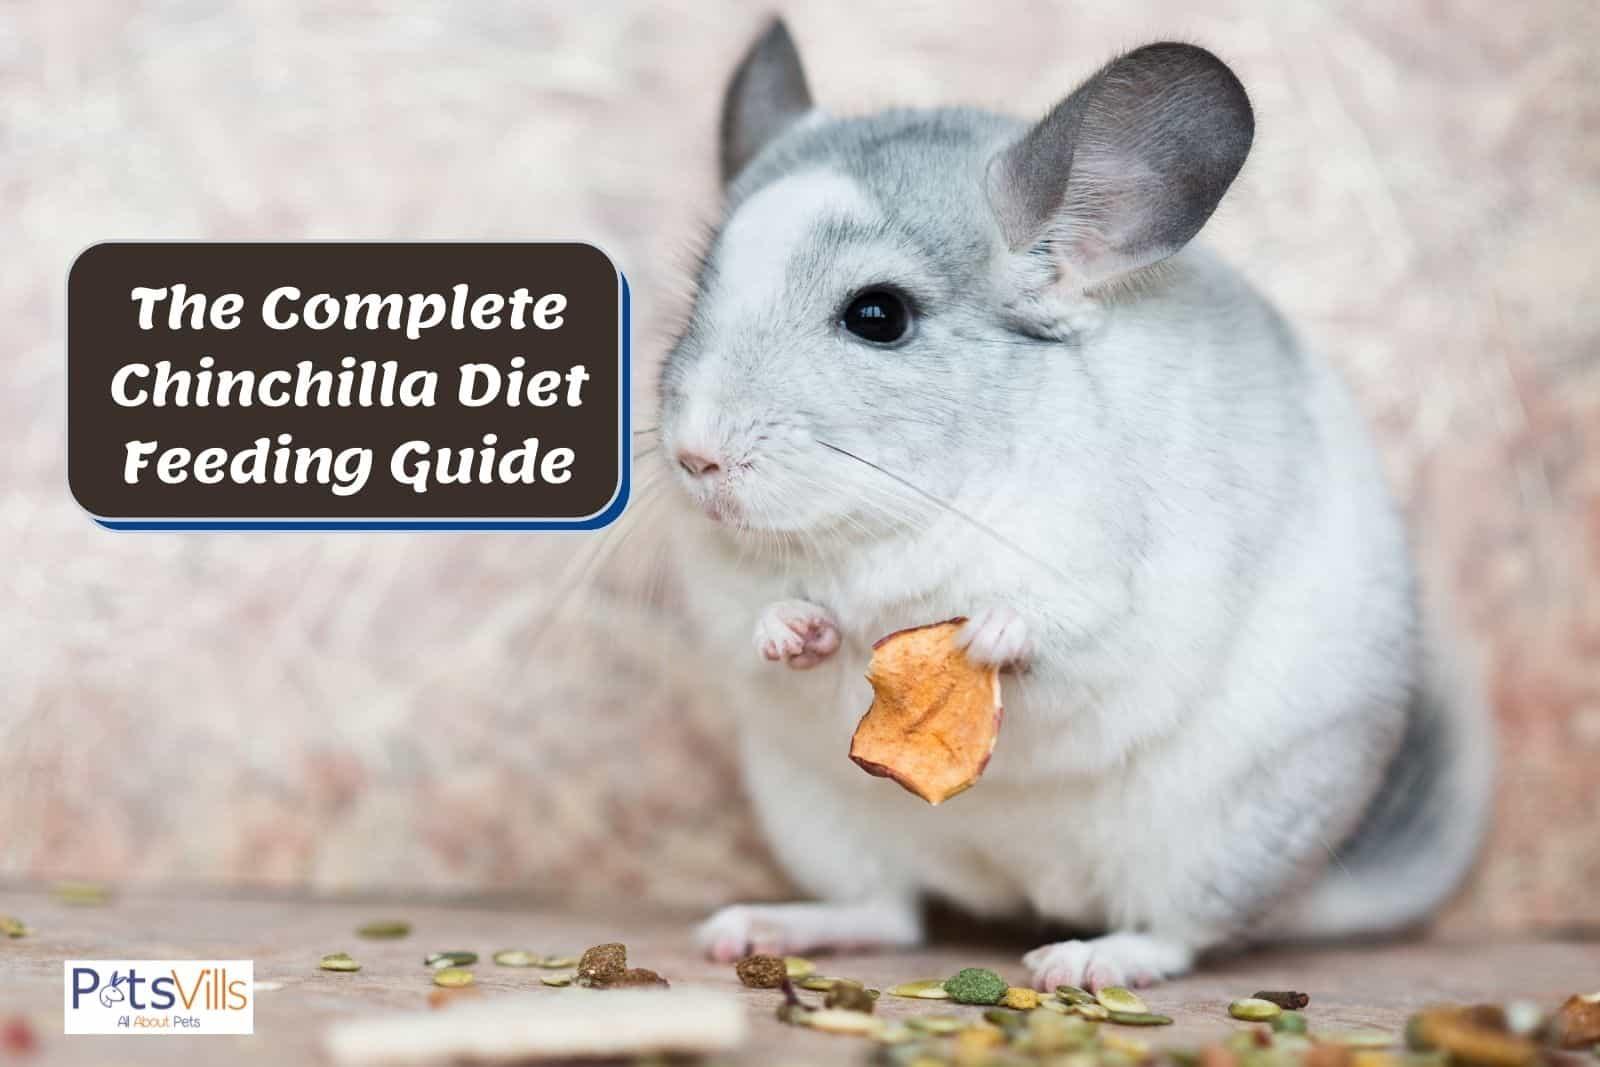 a chinchilla eating food, chinchilla diet feeding guide